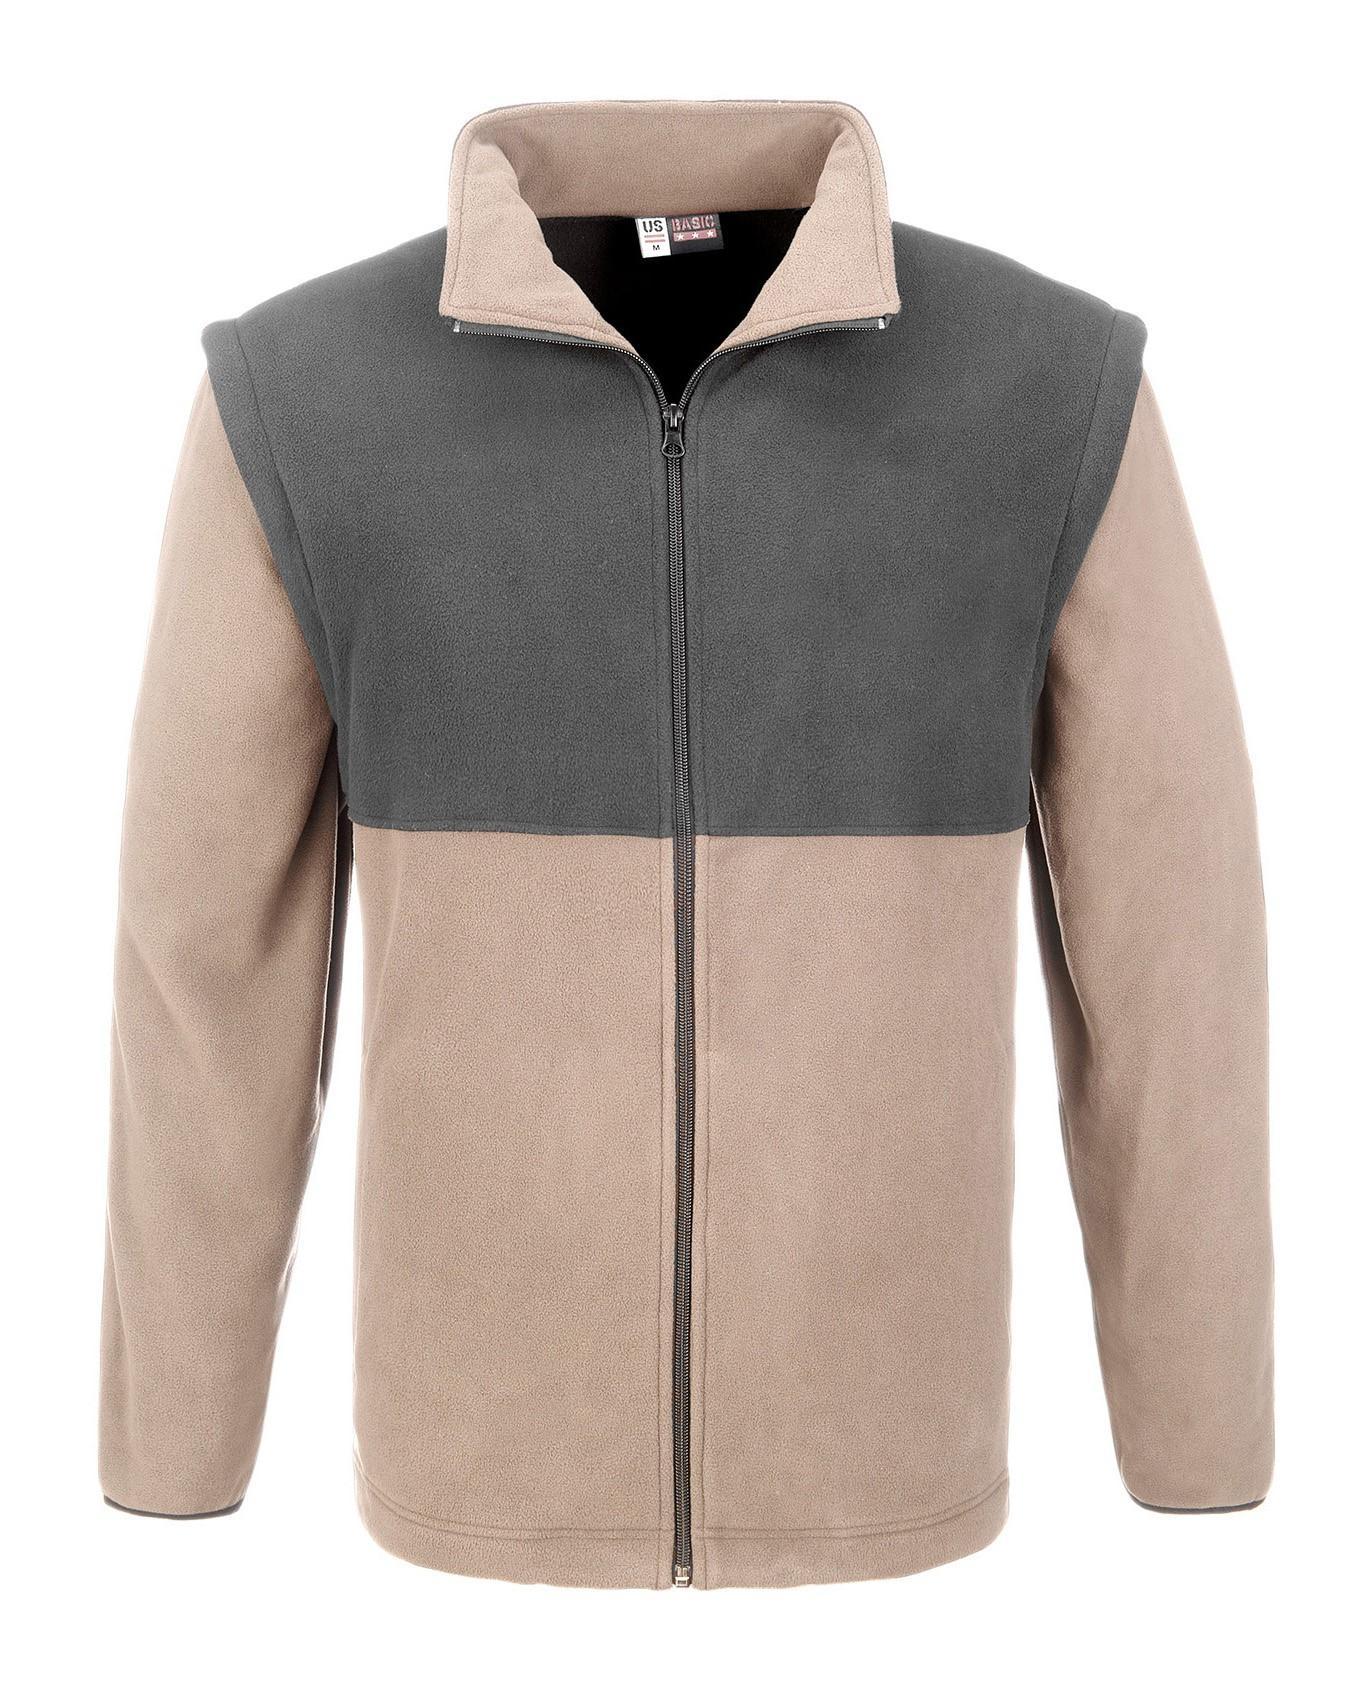 Mens Benneton Zip-off Micro Fleece Jacket - Khaki Only